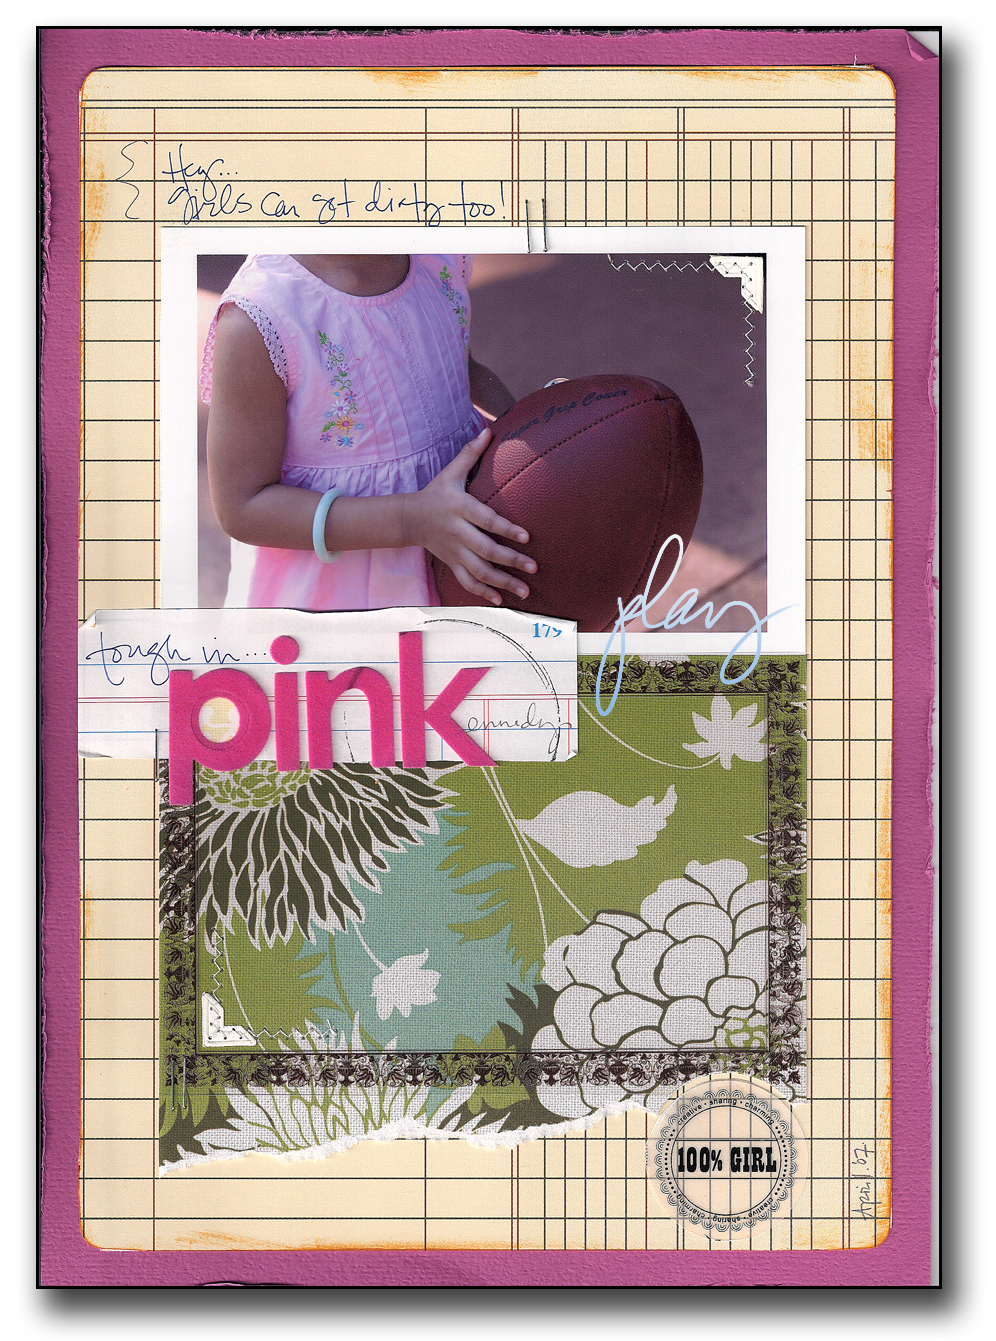 [ Tough In Pink // 2007 ]